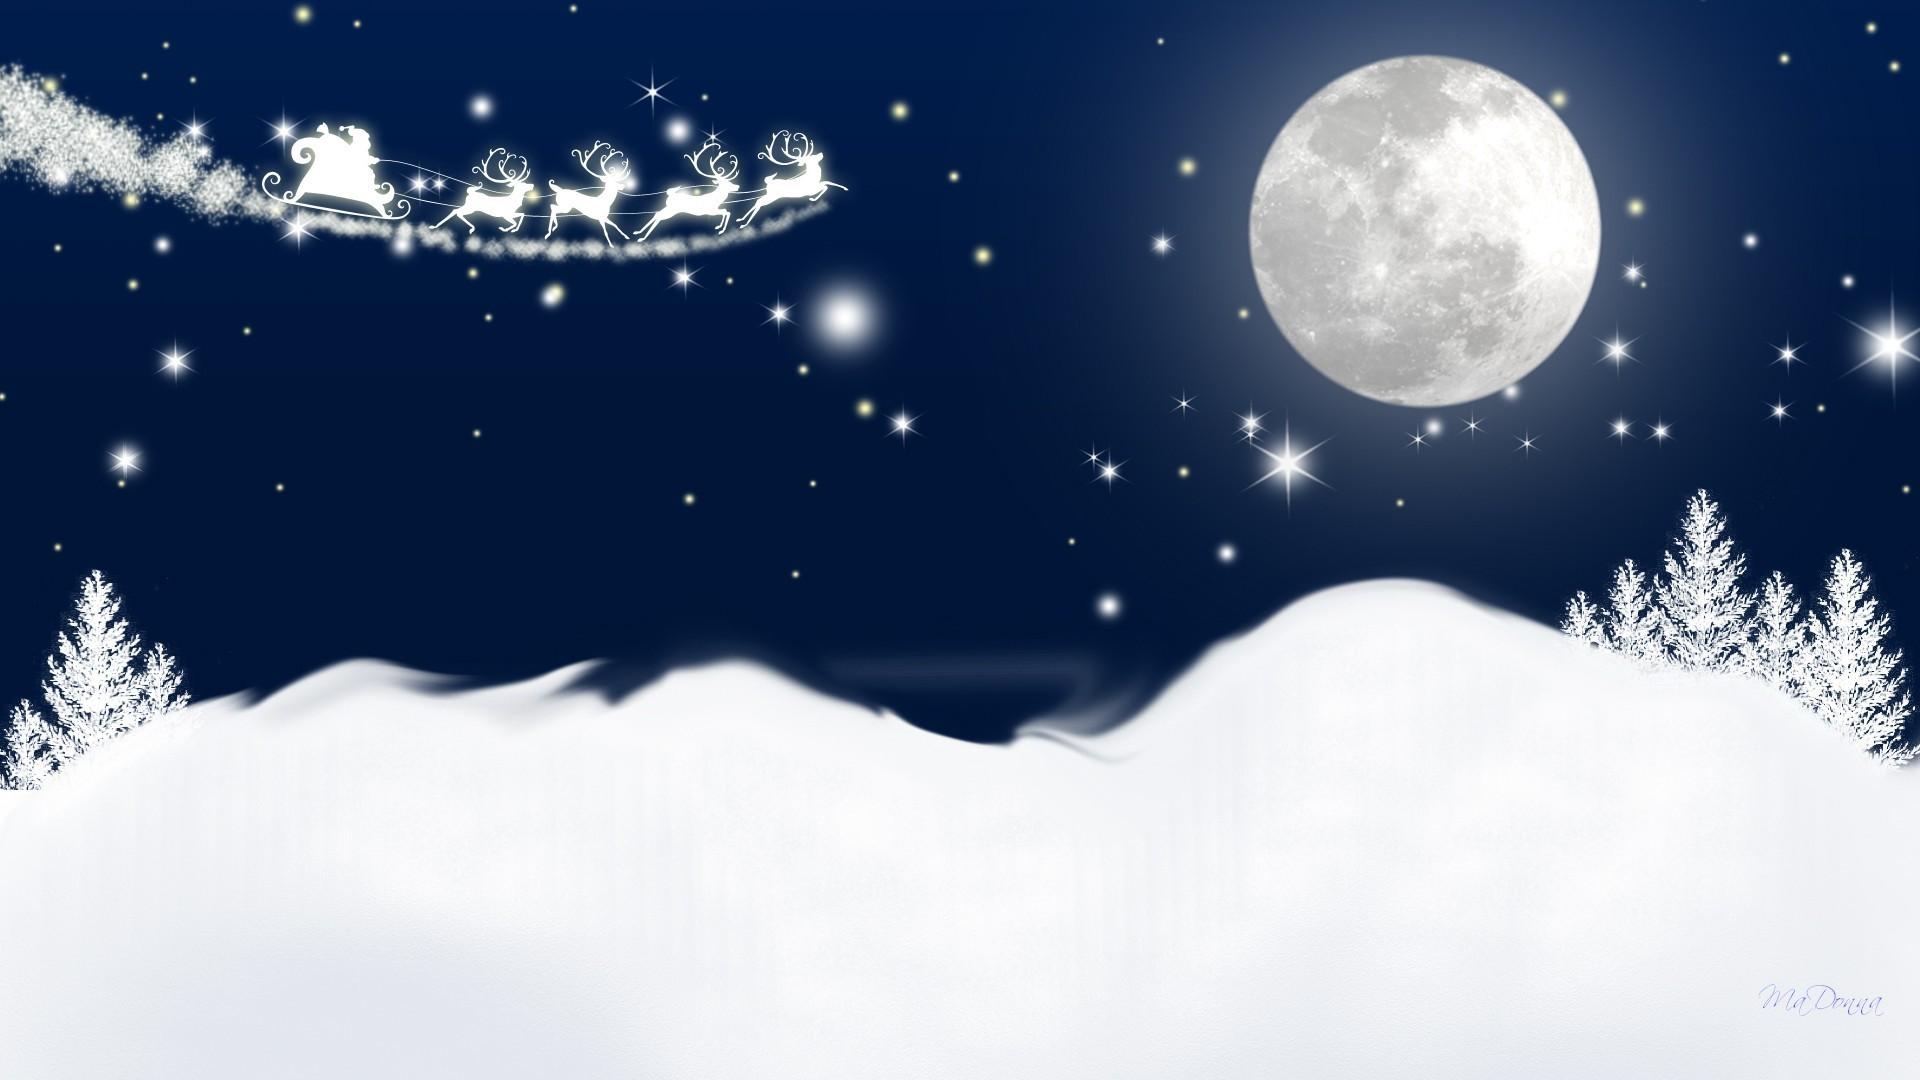 Stars Tag – Sky Sleigh Starlight Flight Feliz Moon Santa Reindeer Trees  Winter Firefox Eve Moonlight